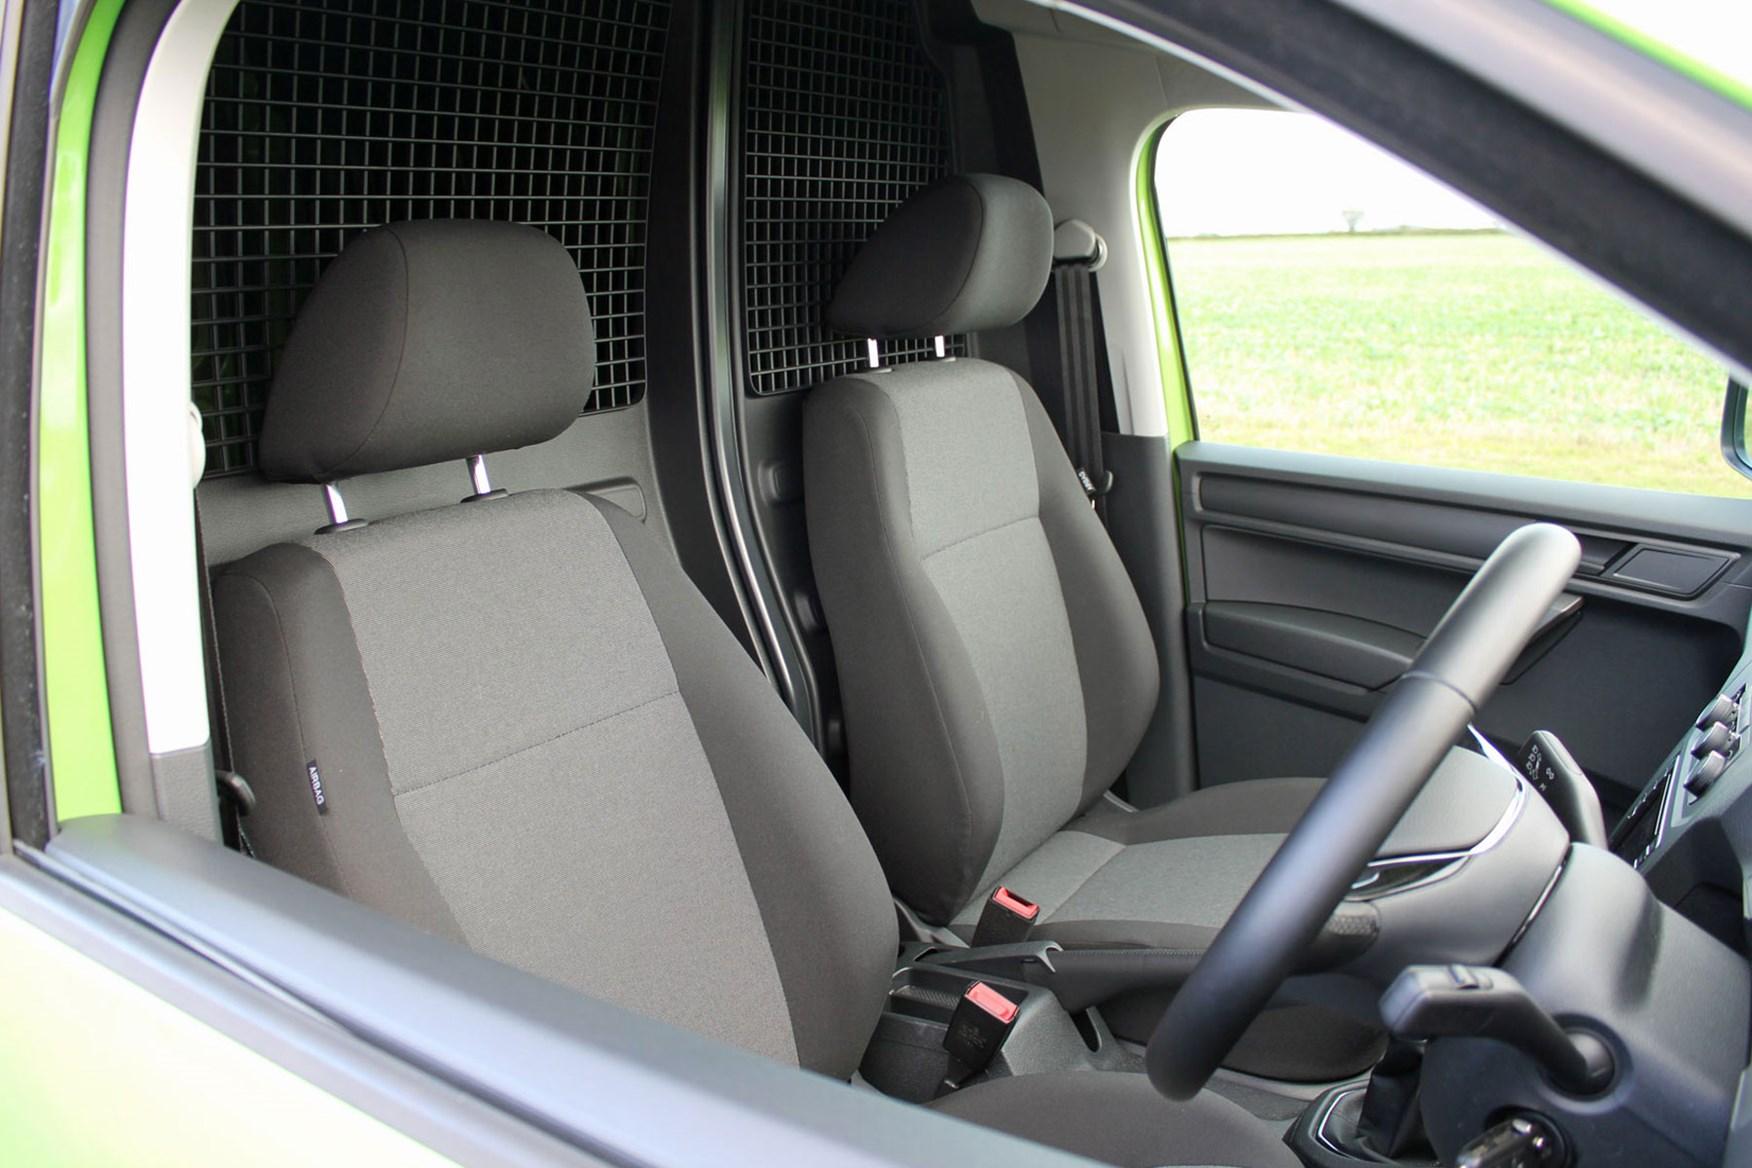 VW Caddy 1.0-litre TSI 102 review - seats, 2017